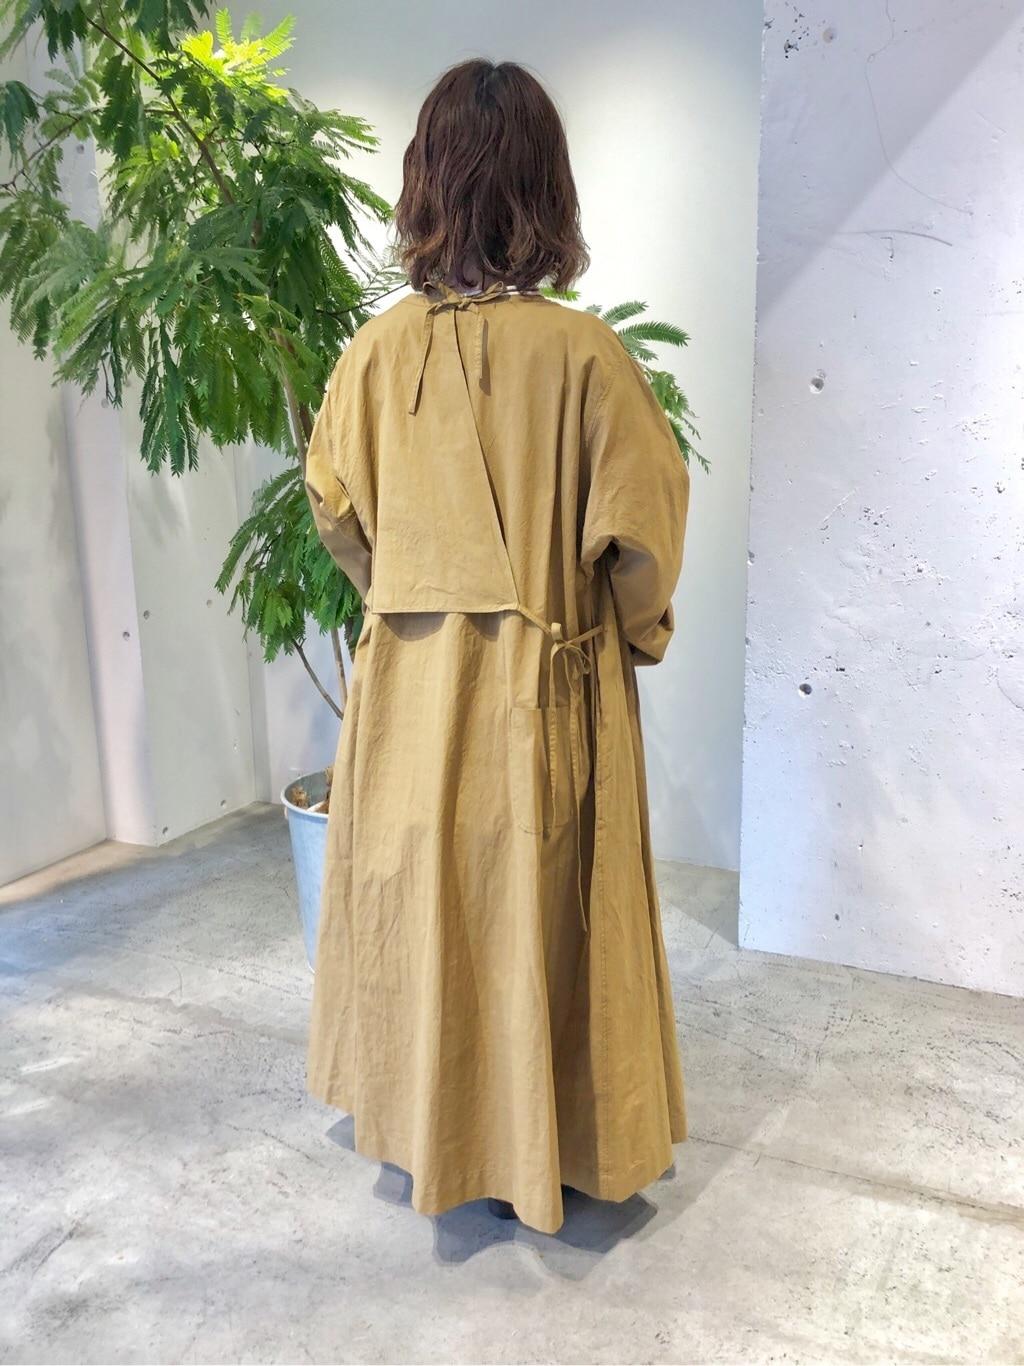 chambre de charme 京都路面 身長:150cm 2020.04.17